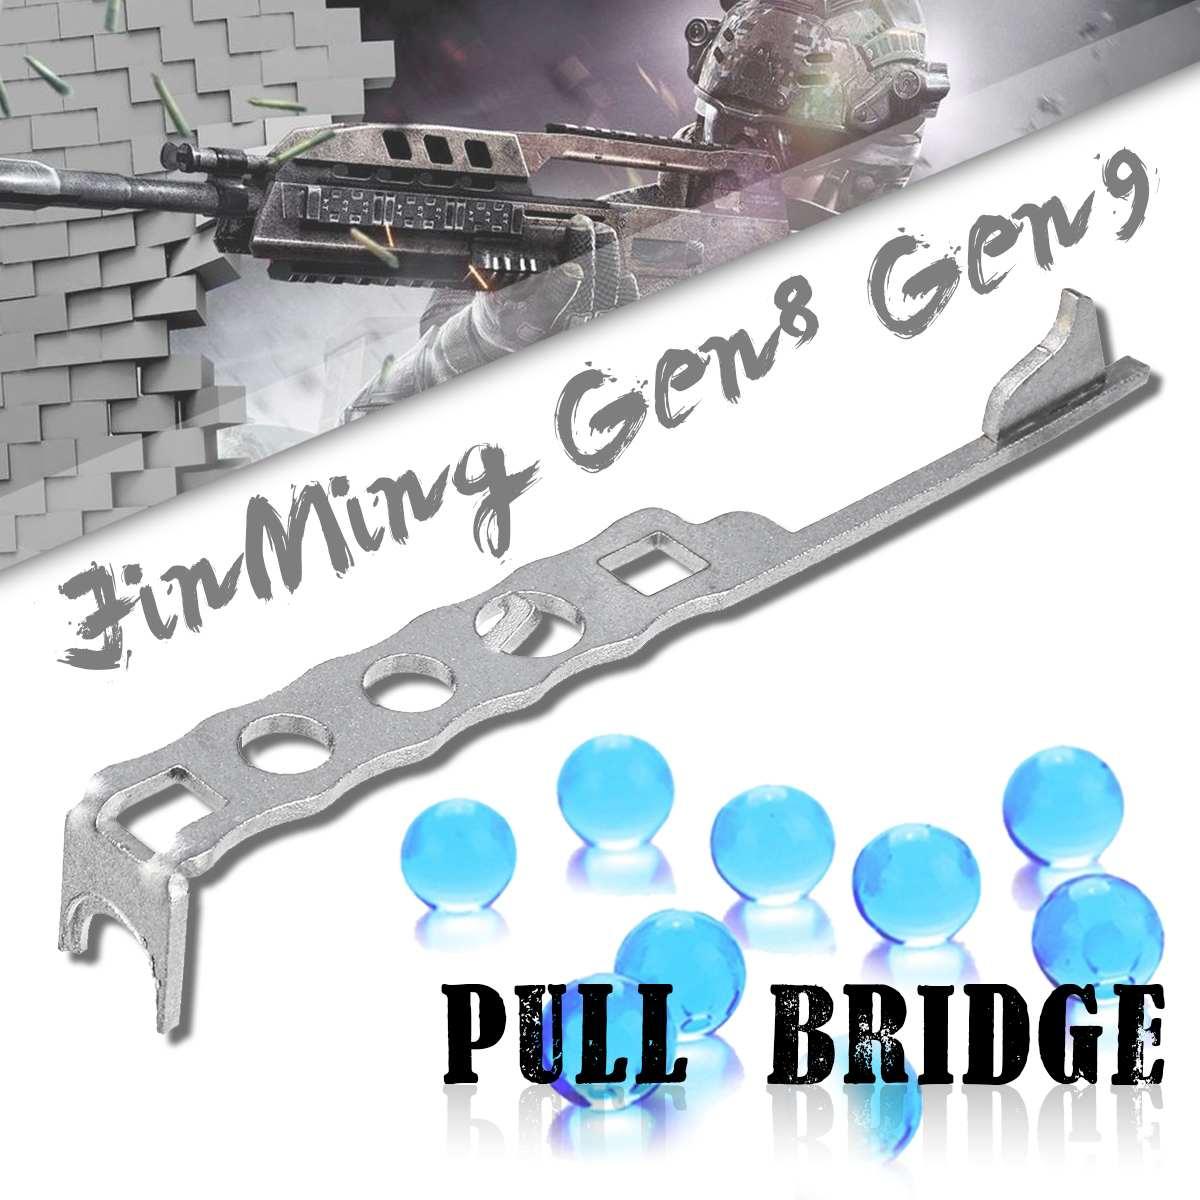 Upgrade Metal Pull Bridge For JinMing Gen8 Gen9 Gel Ball Blasters Water Games Toy Guns Replacement Accessories